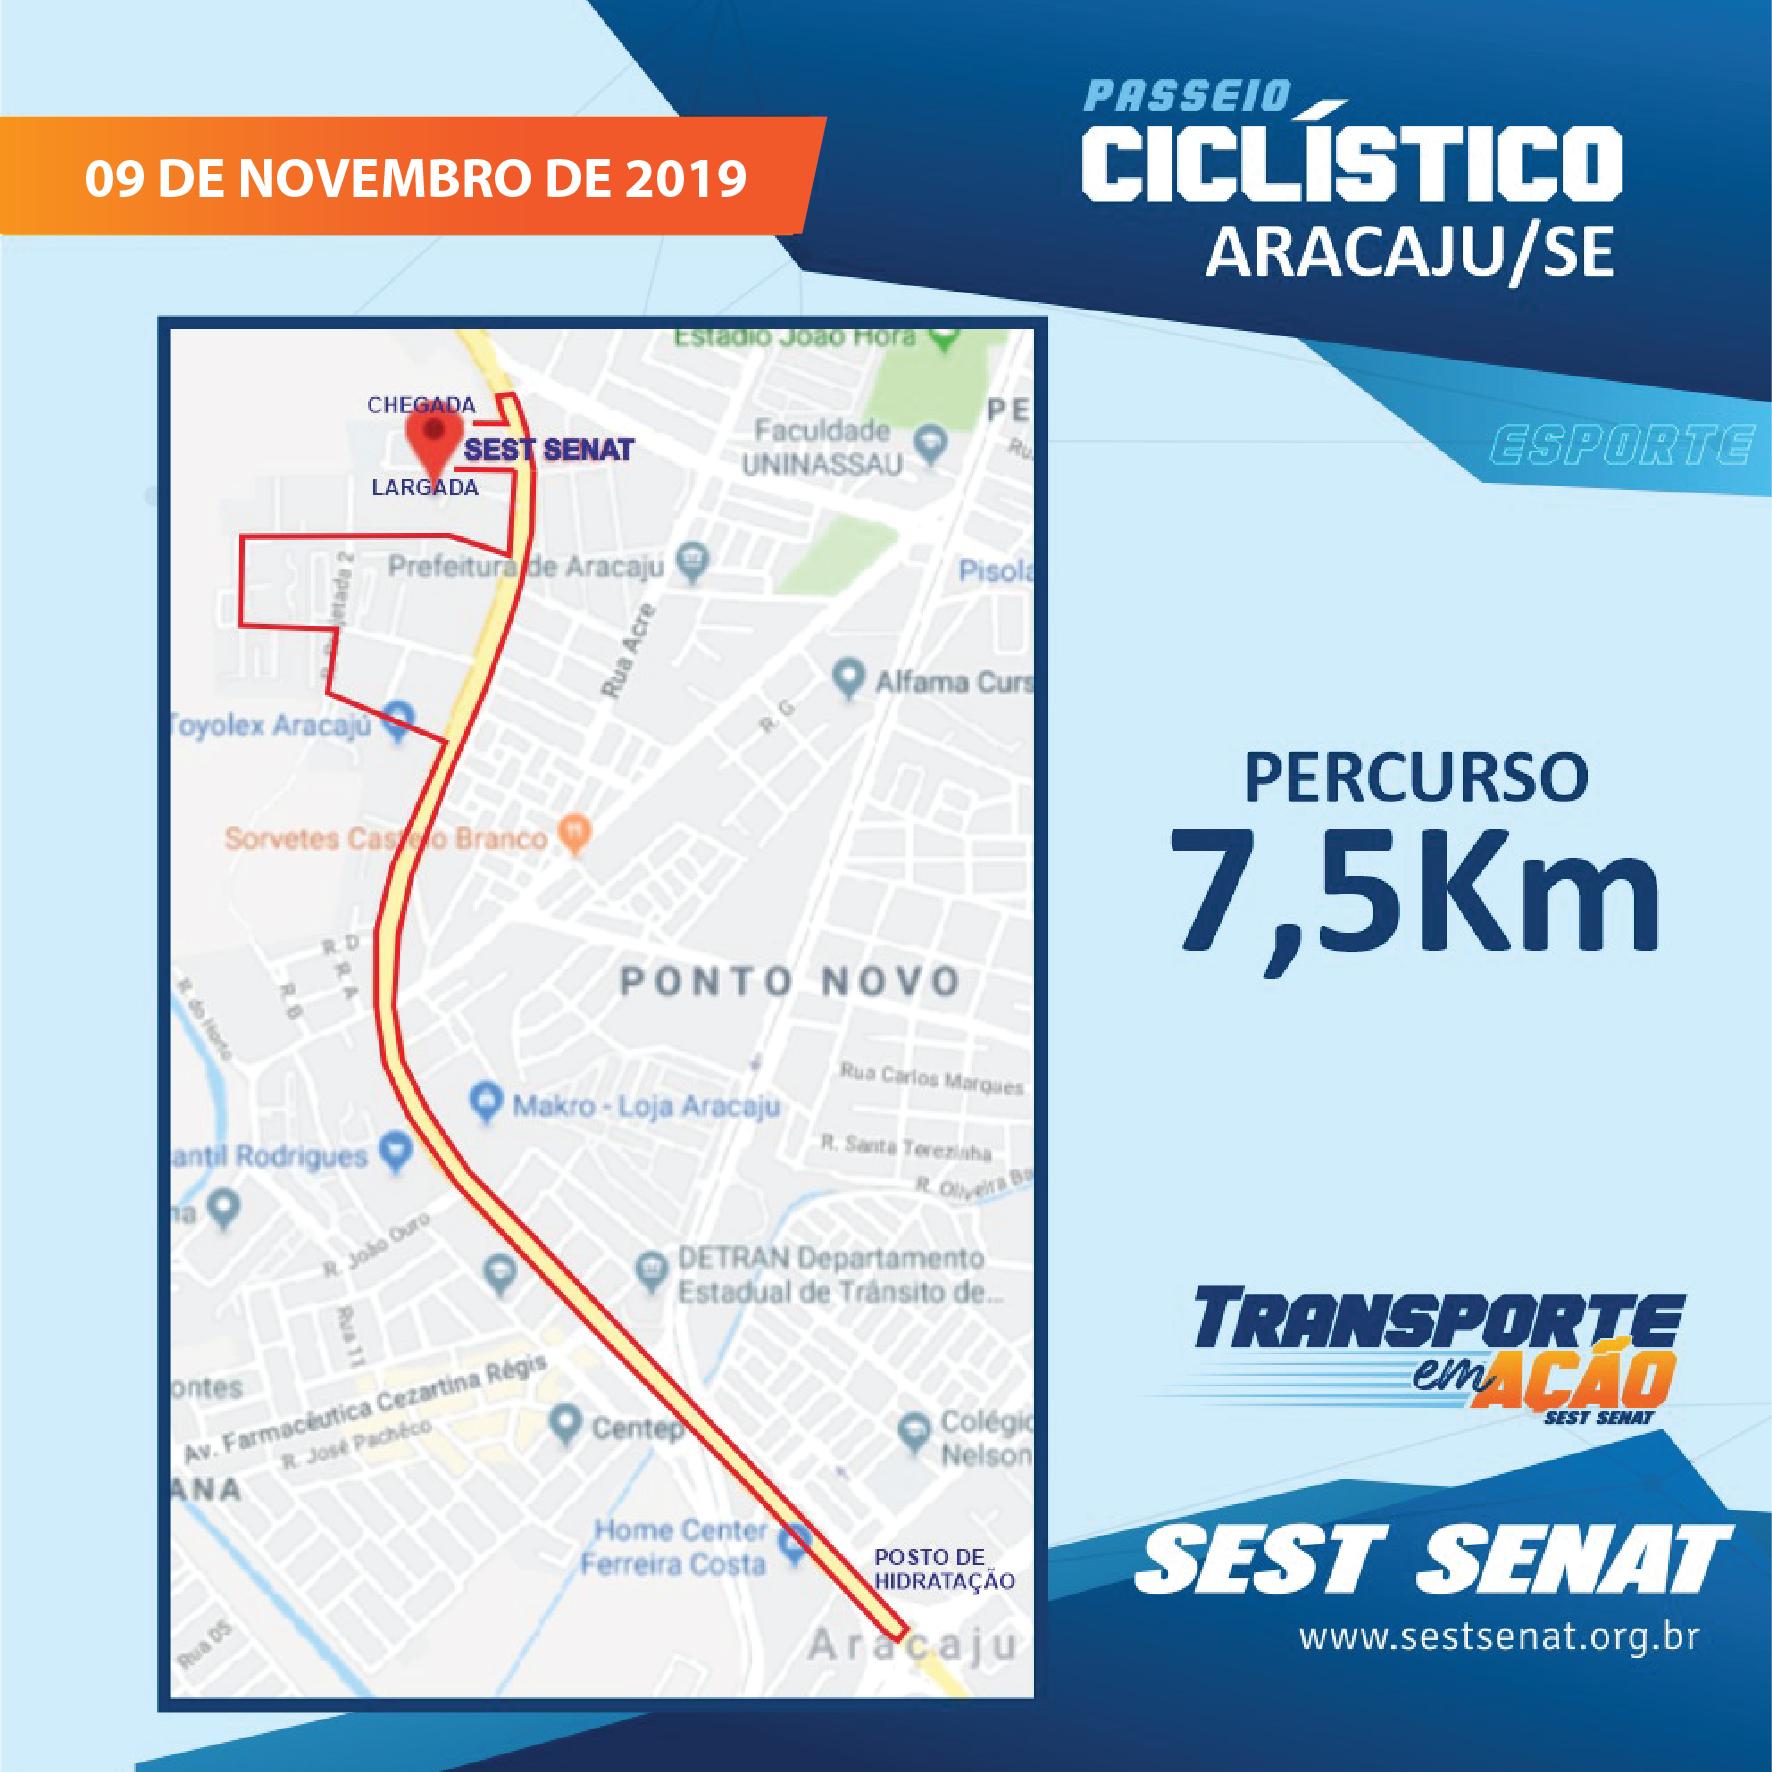 Sest Senat promove passeio Ciclístico neste sábado, 9